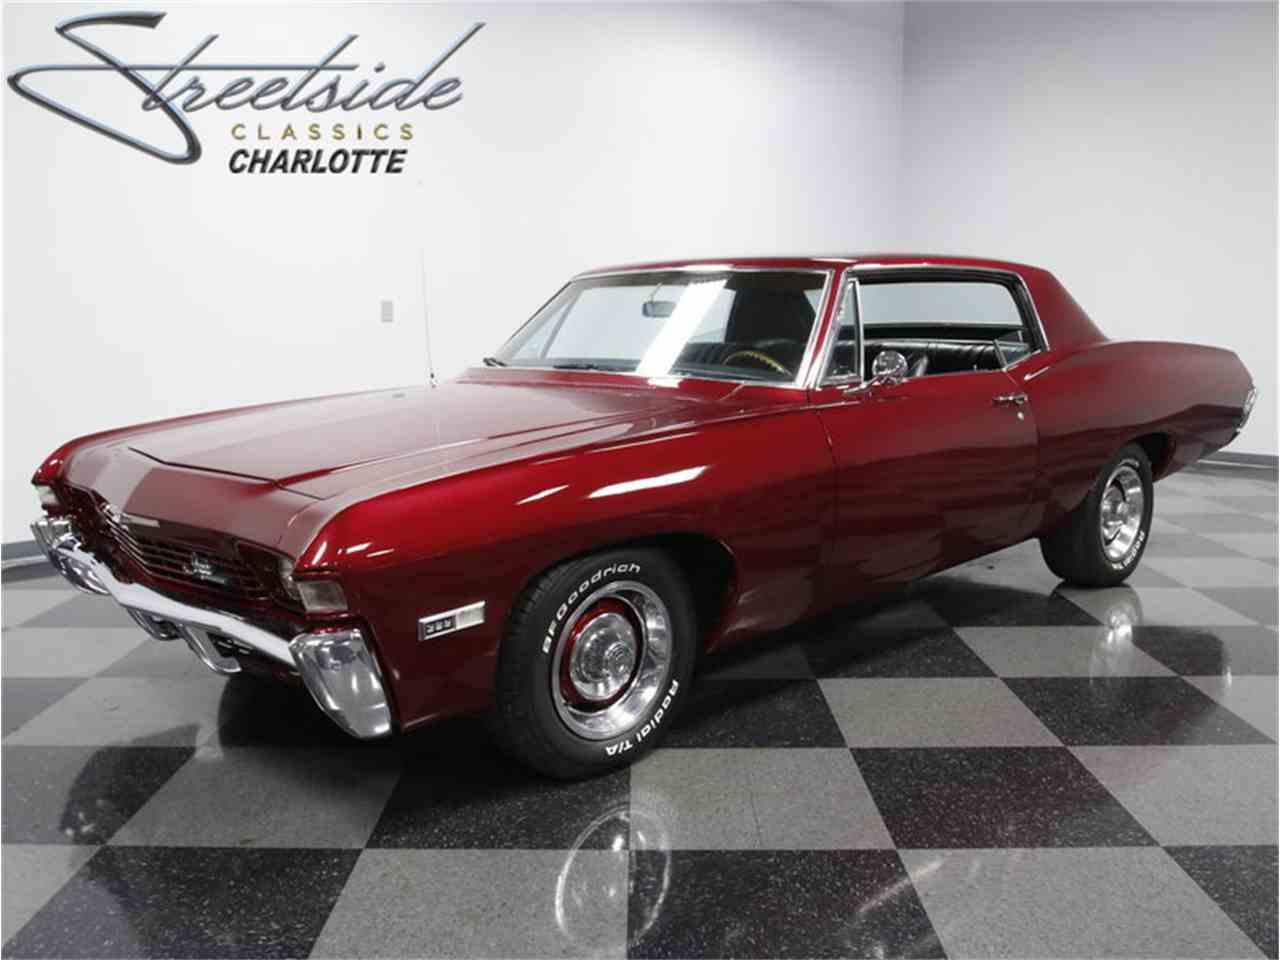 Impala 1968 chevy impala parts : 1968 Chevrolet Impala SS for Sale on ClassicCars.com